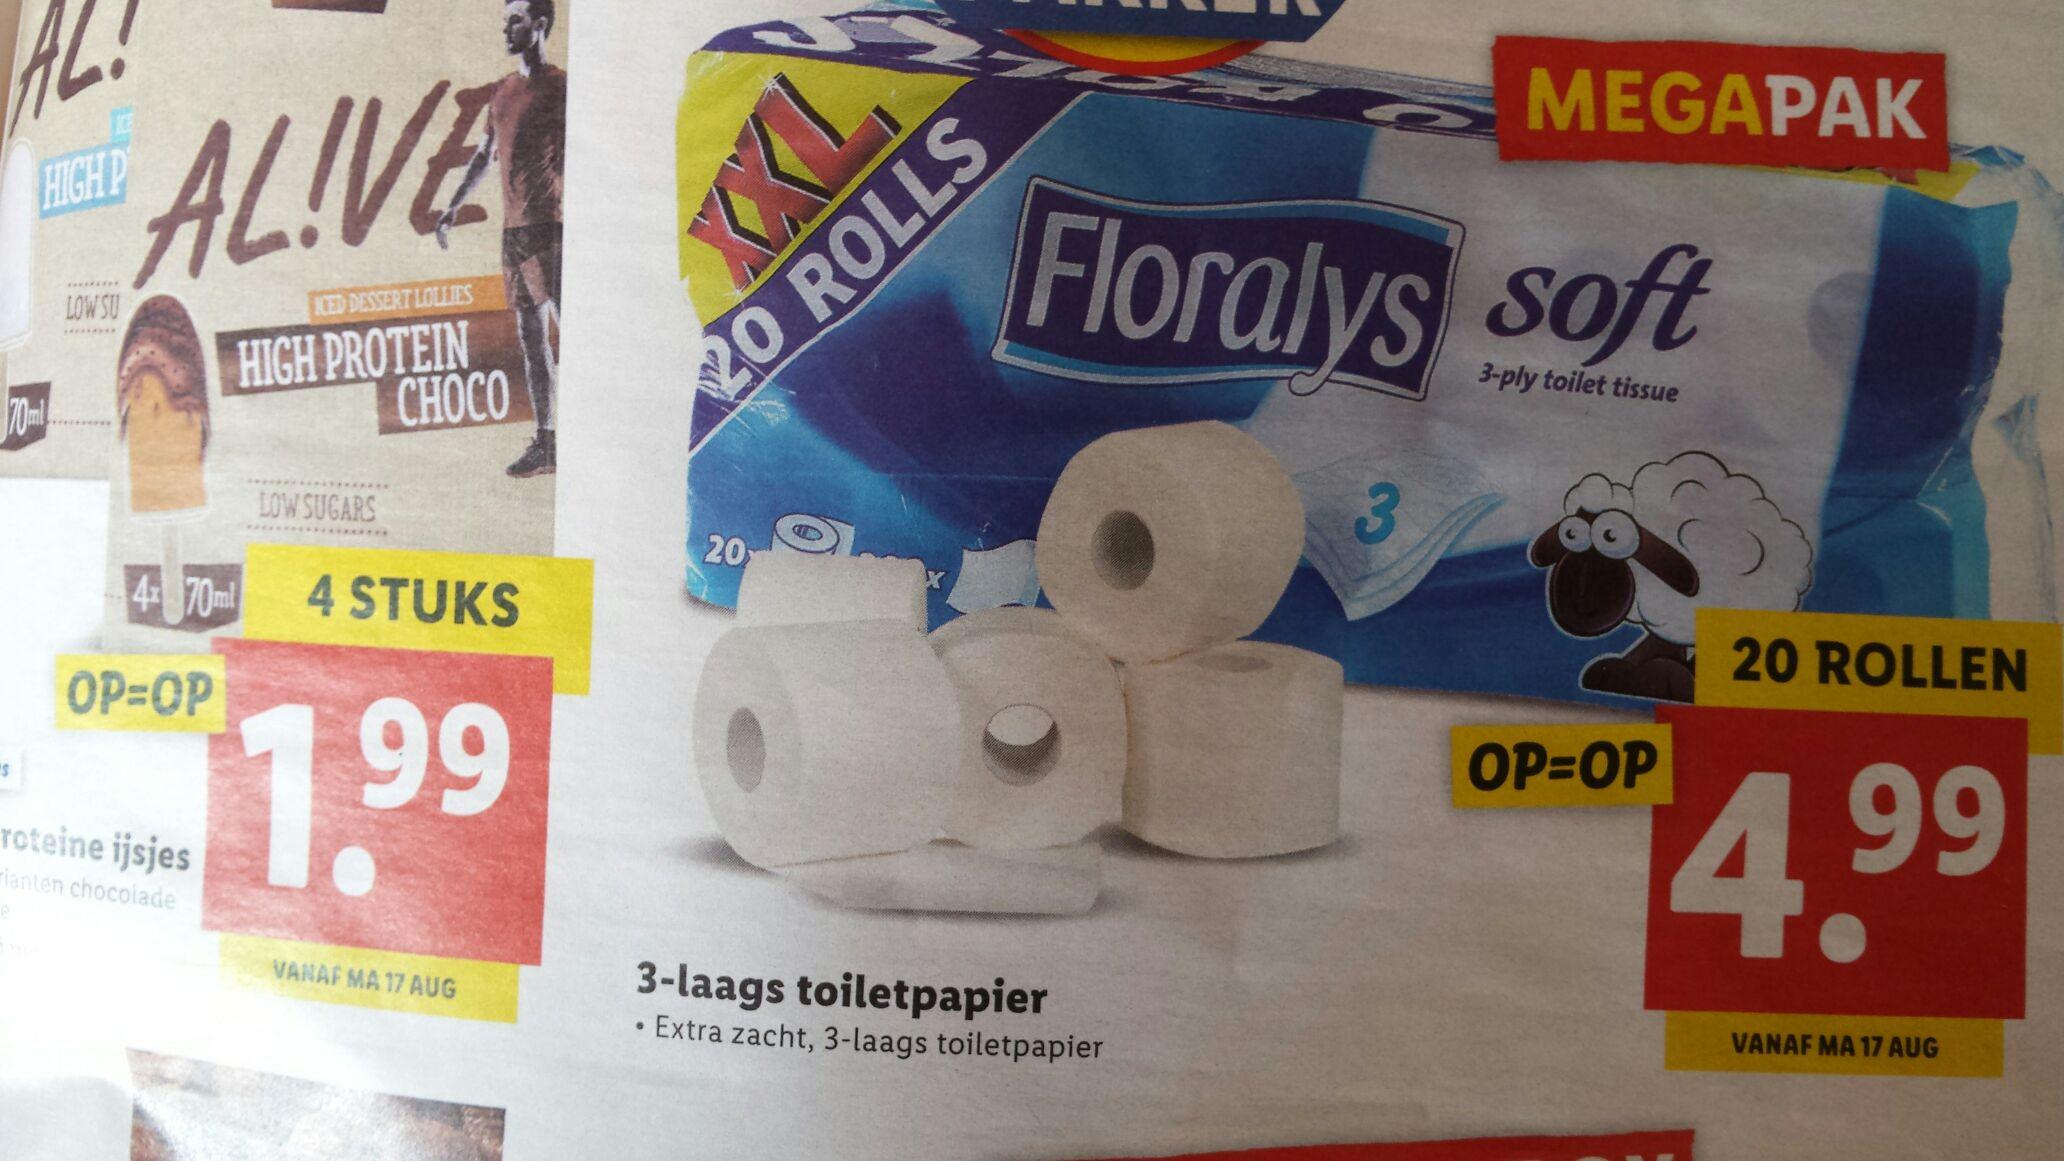 Toiletpapier Lidl megapak 20 rollen, 3 laags, 200 velletjes per rol.